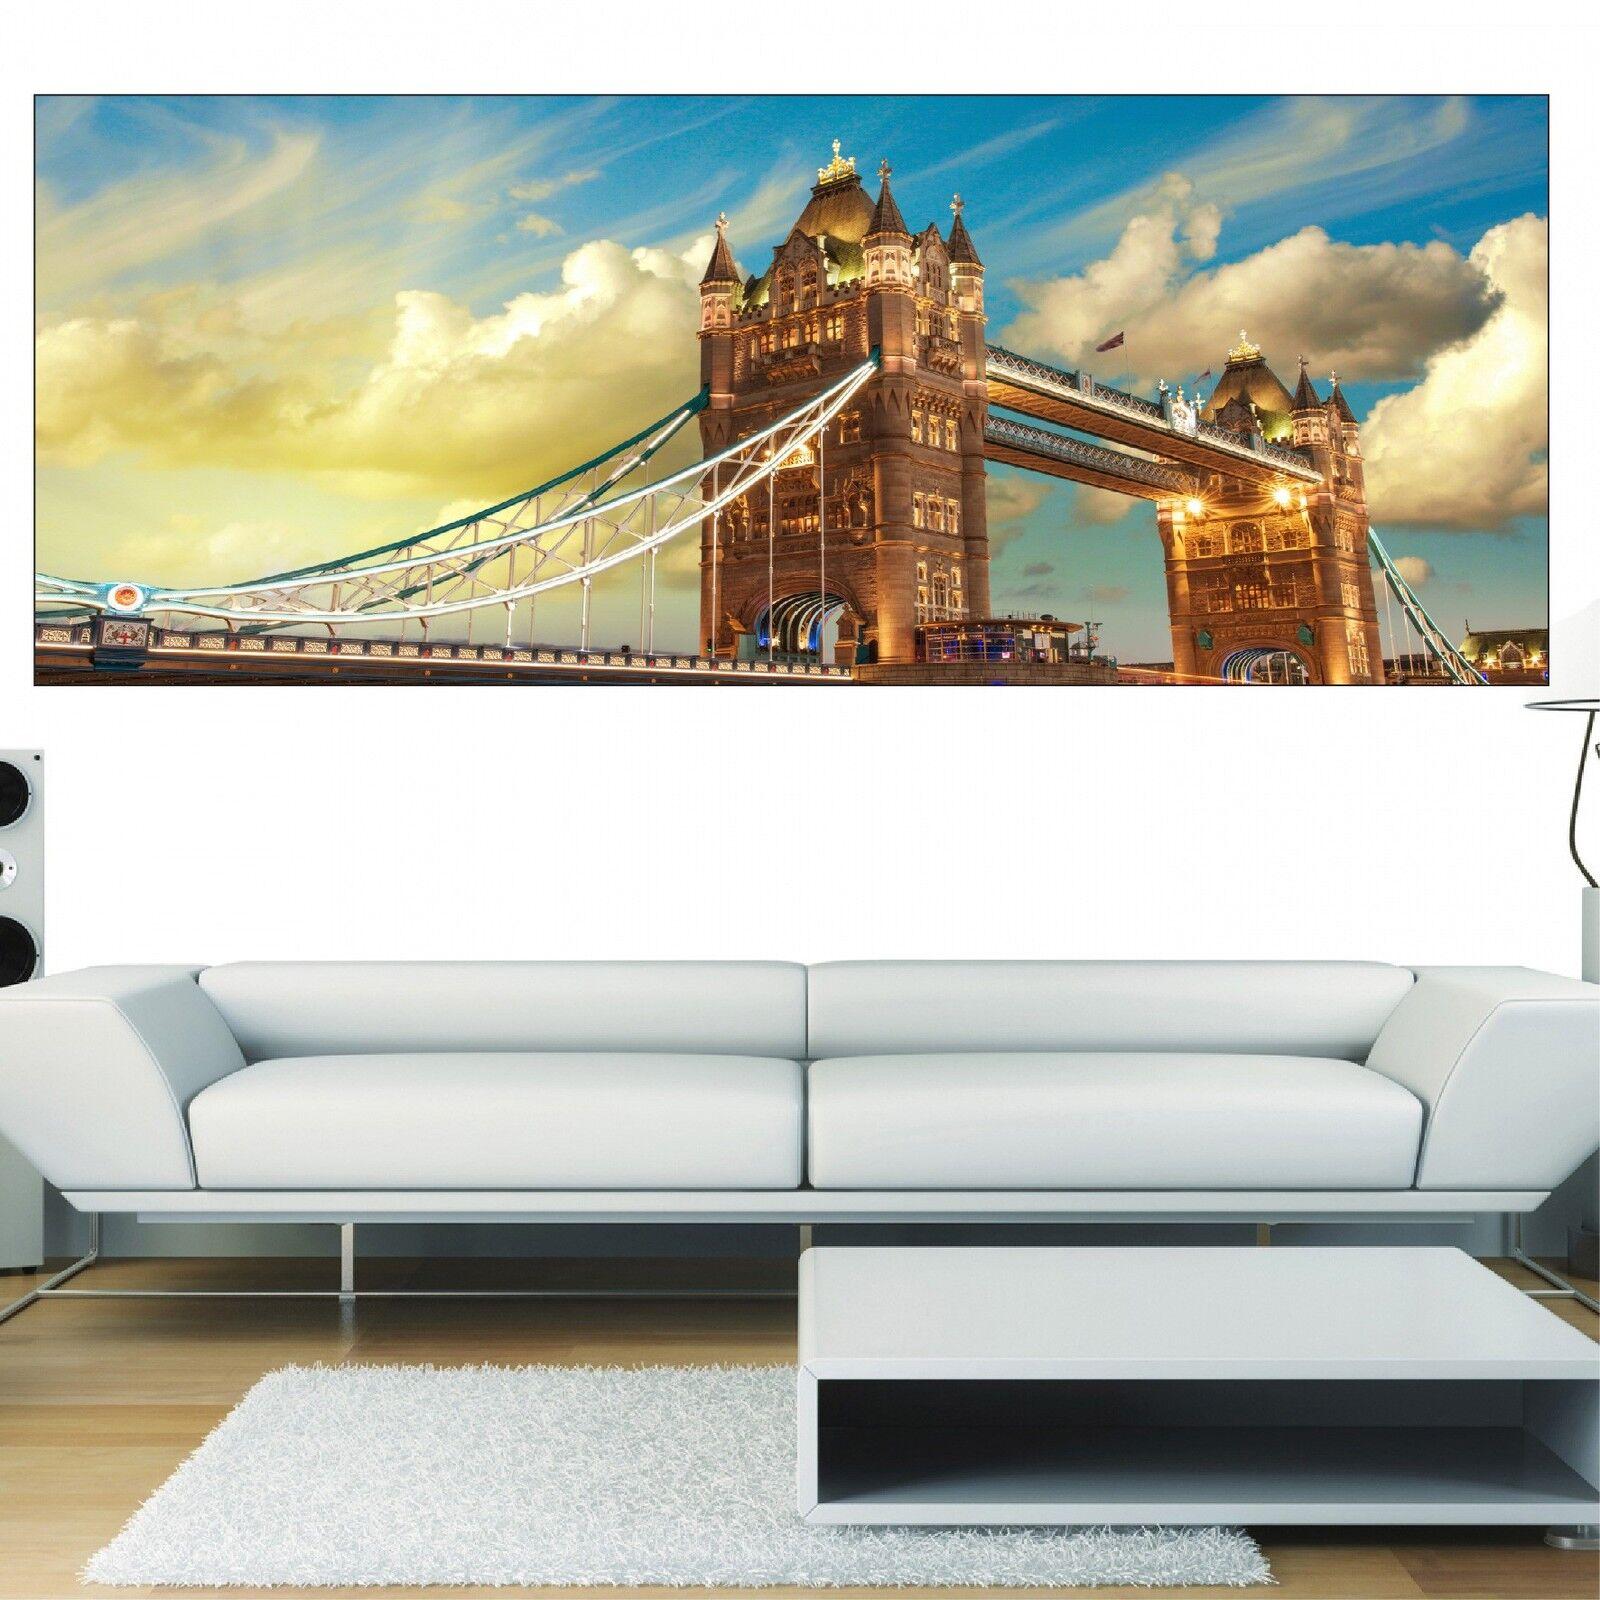 Papel pintado panorámica Londres 3608 Arte decoración Pegatinas